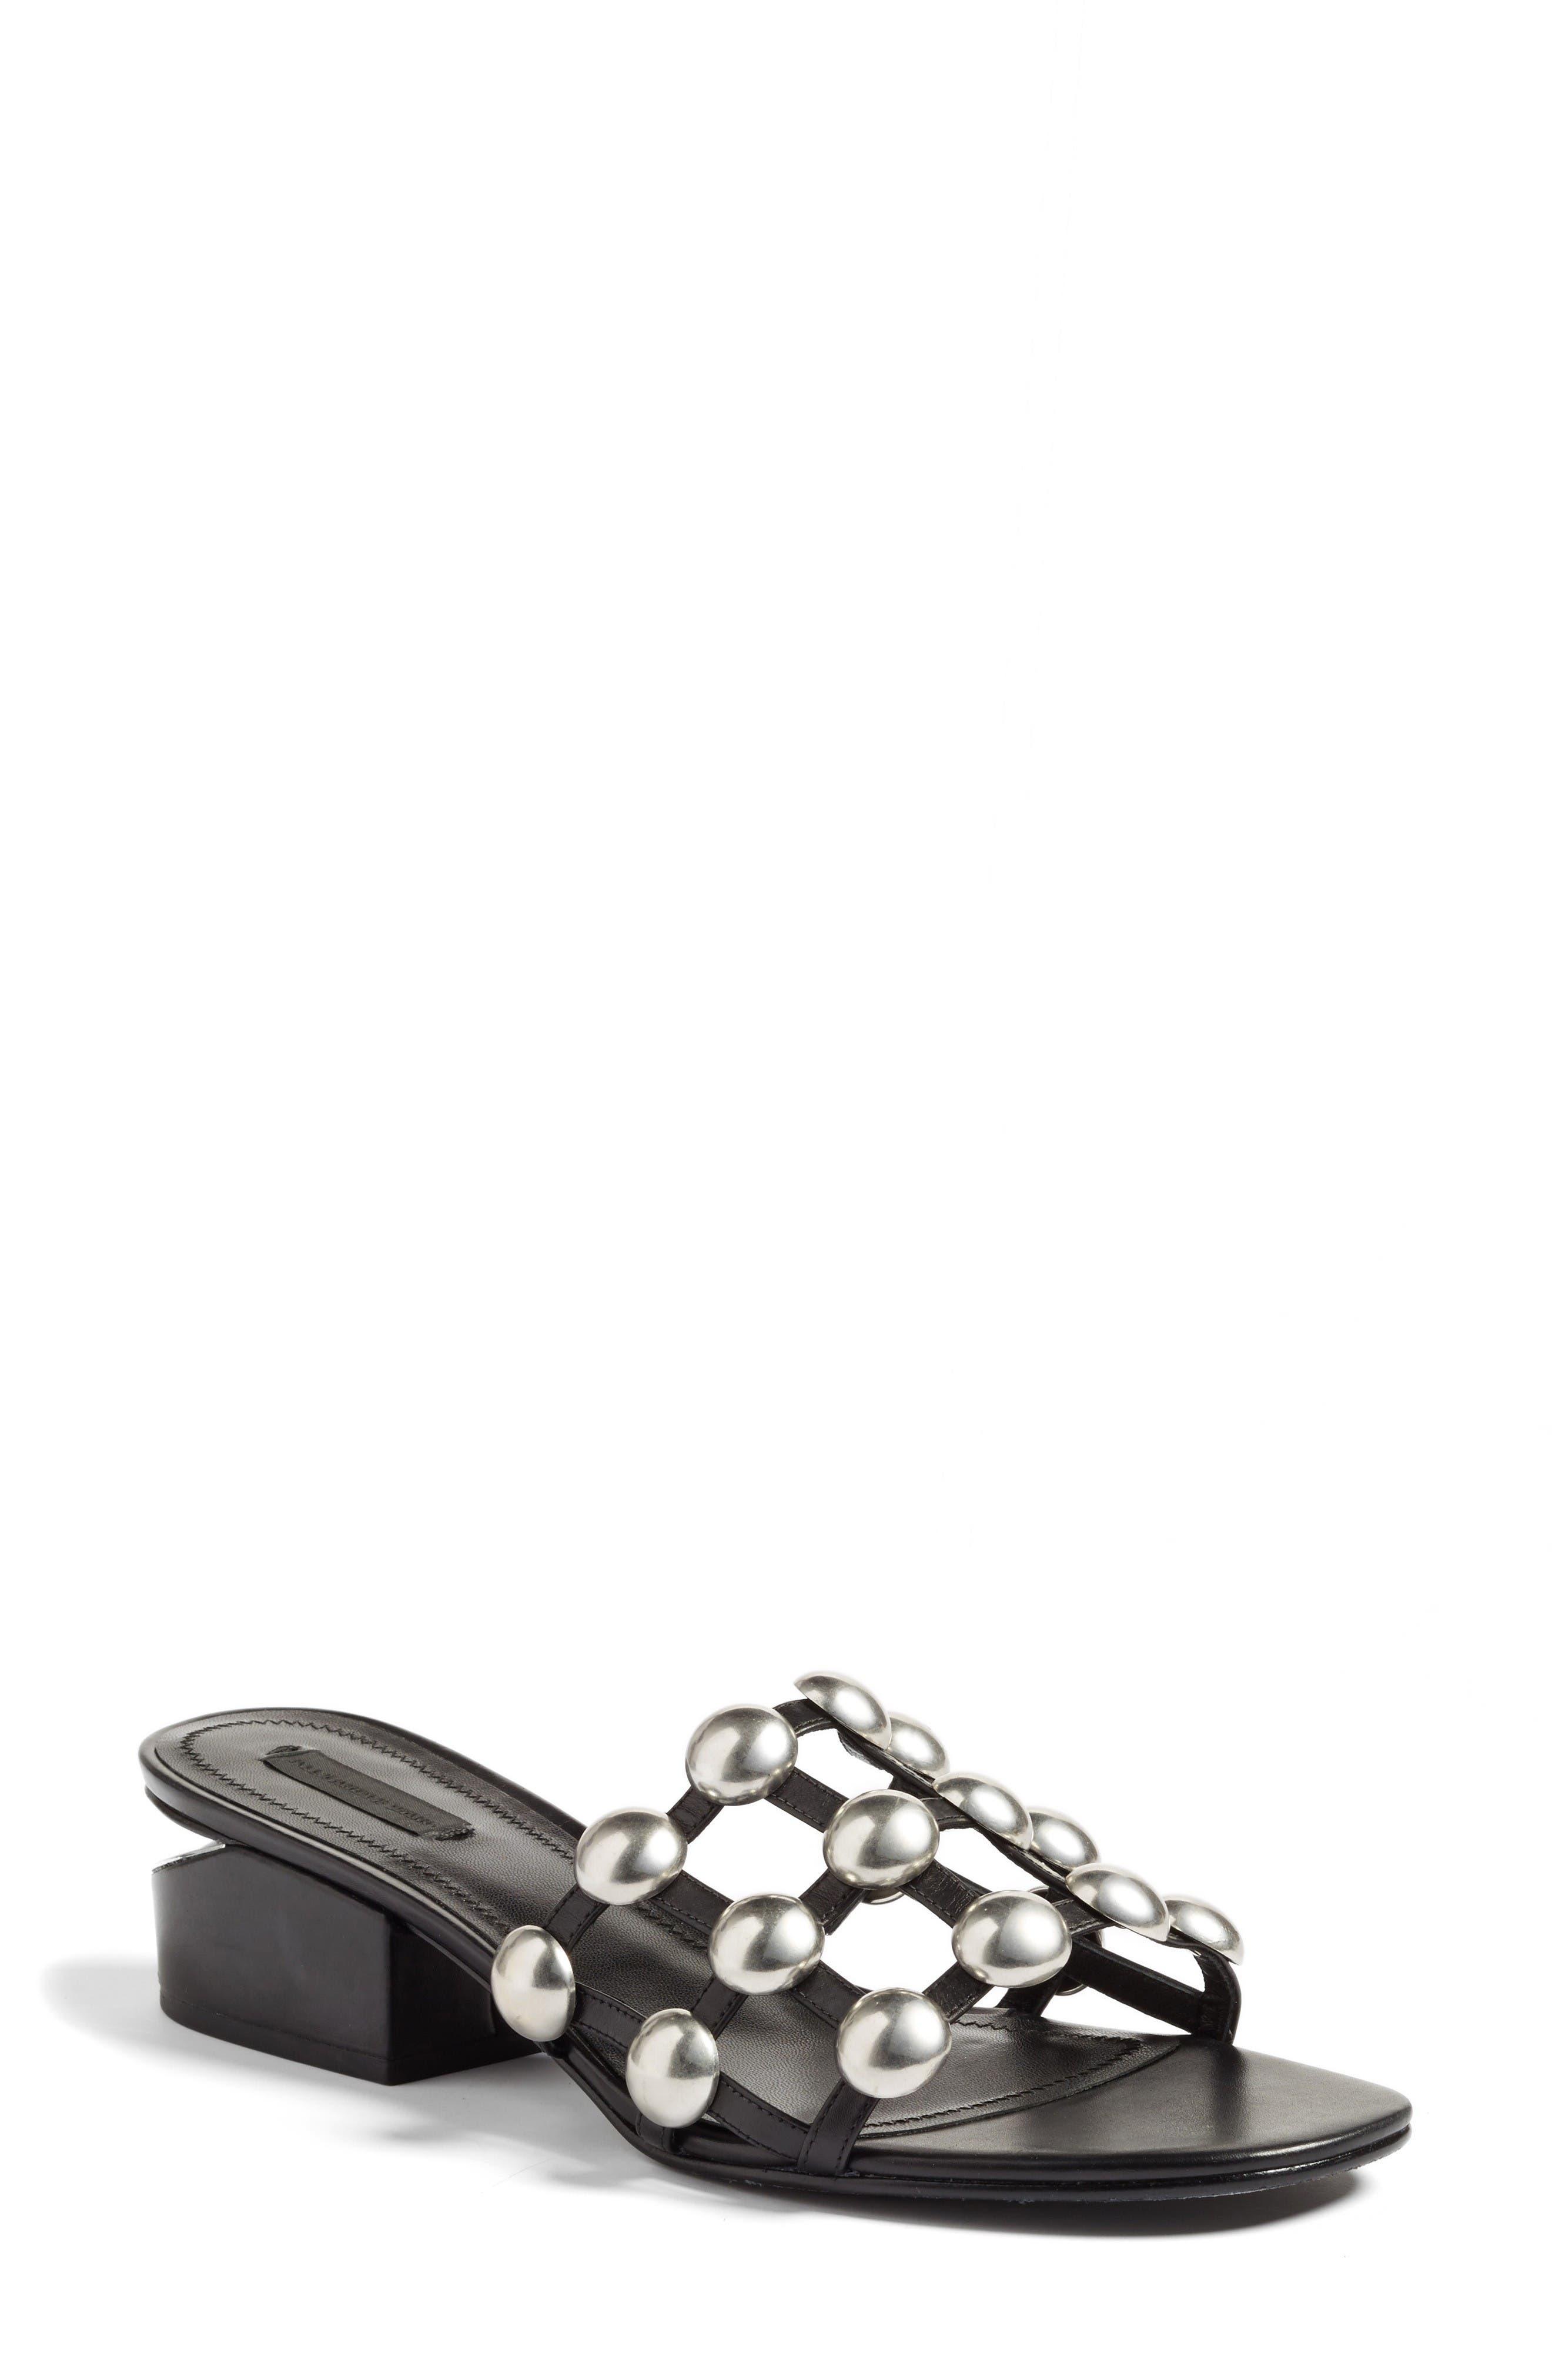 Main Image - Alexander Wang Lou Stud Slide Sandal (Women)